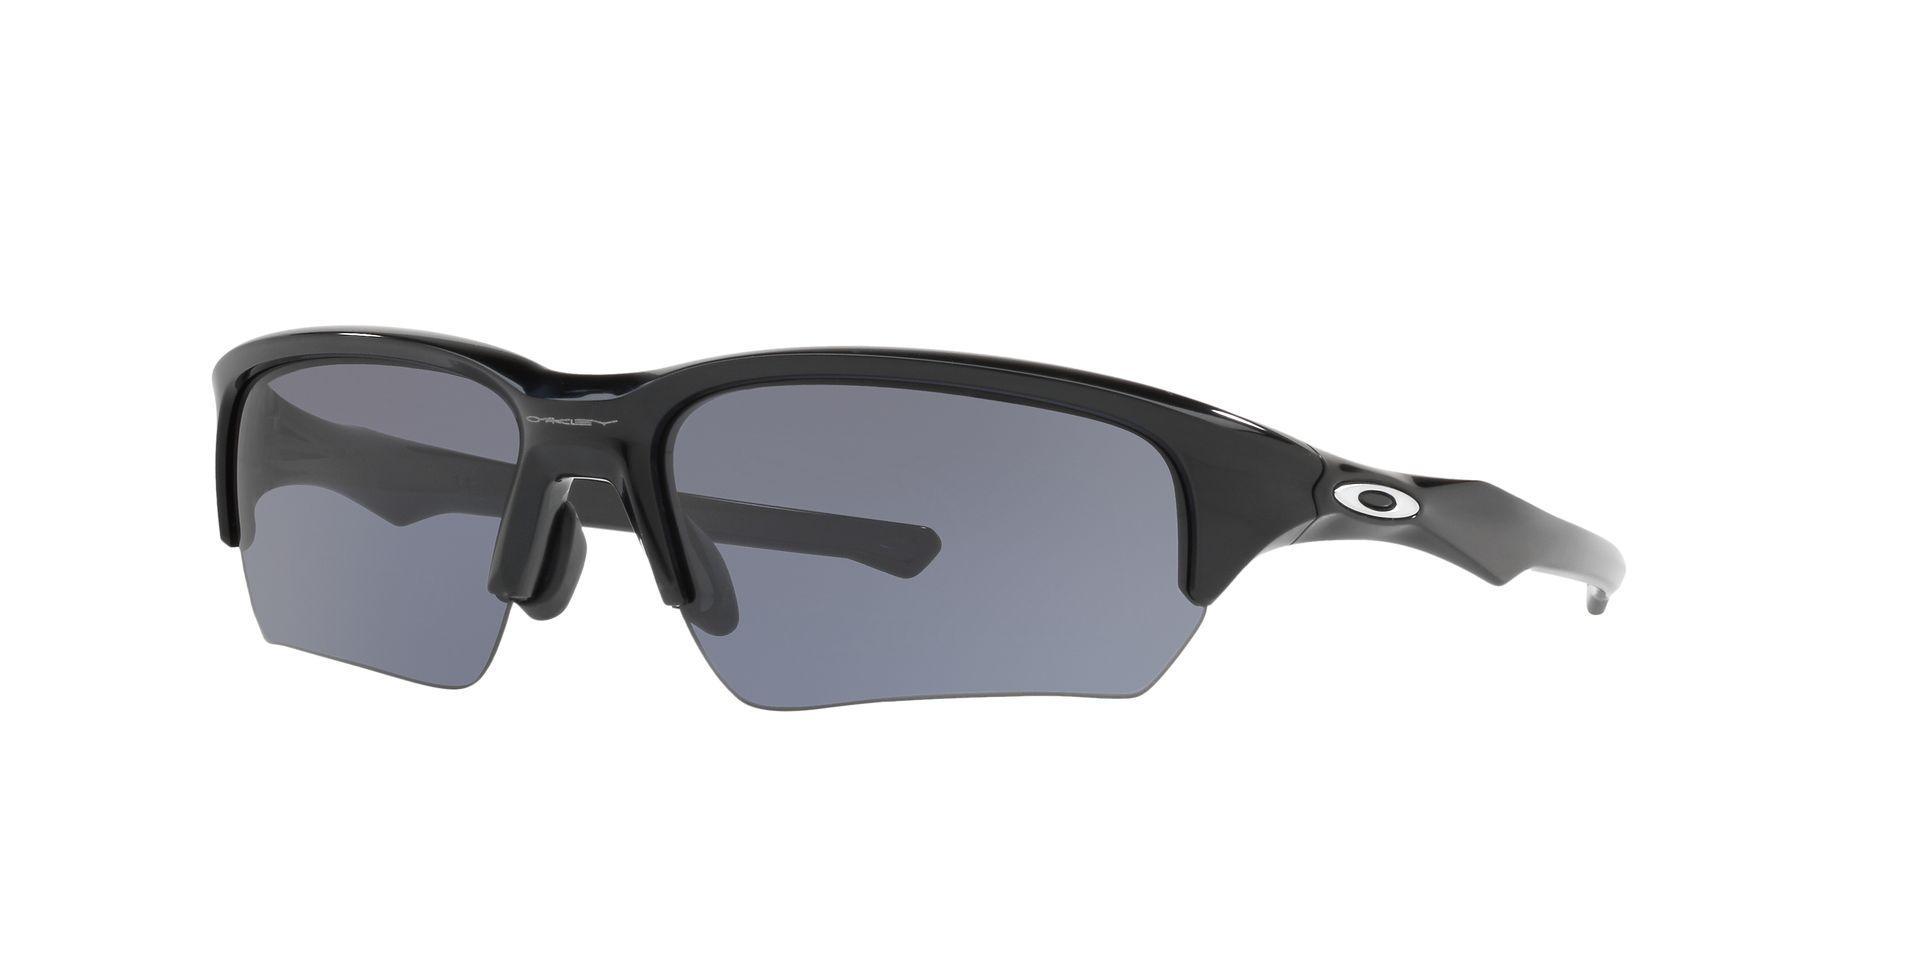 d6f92ac388 Singapore. Oakley Sunglasses Flak Beta - OO9372 937201 - Size 65